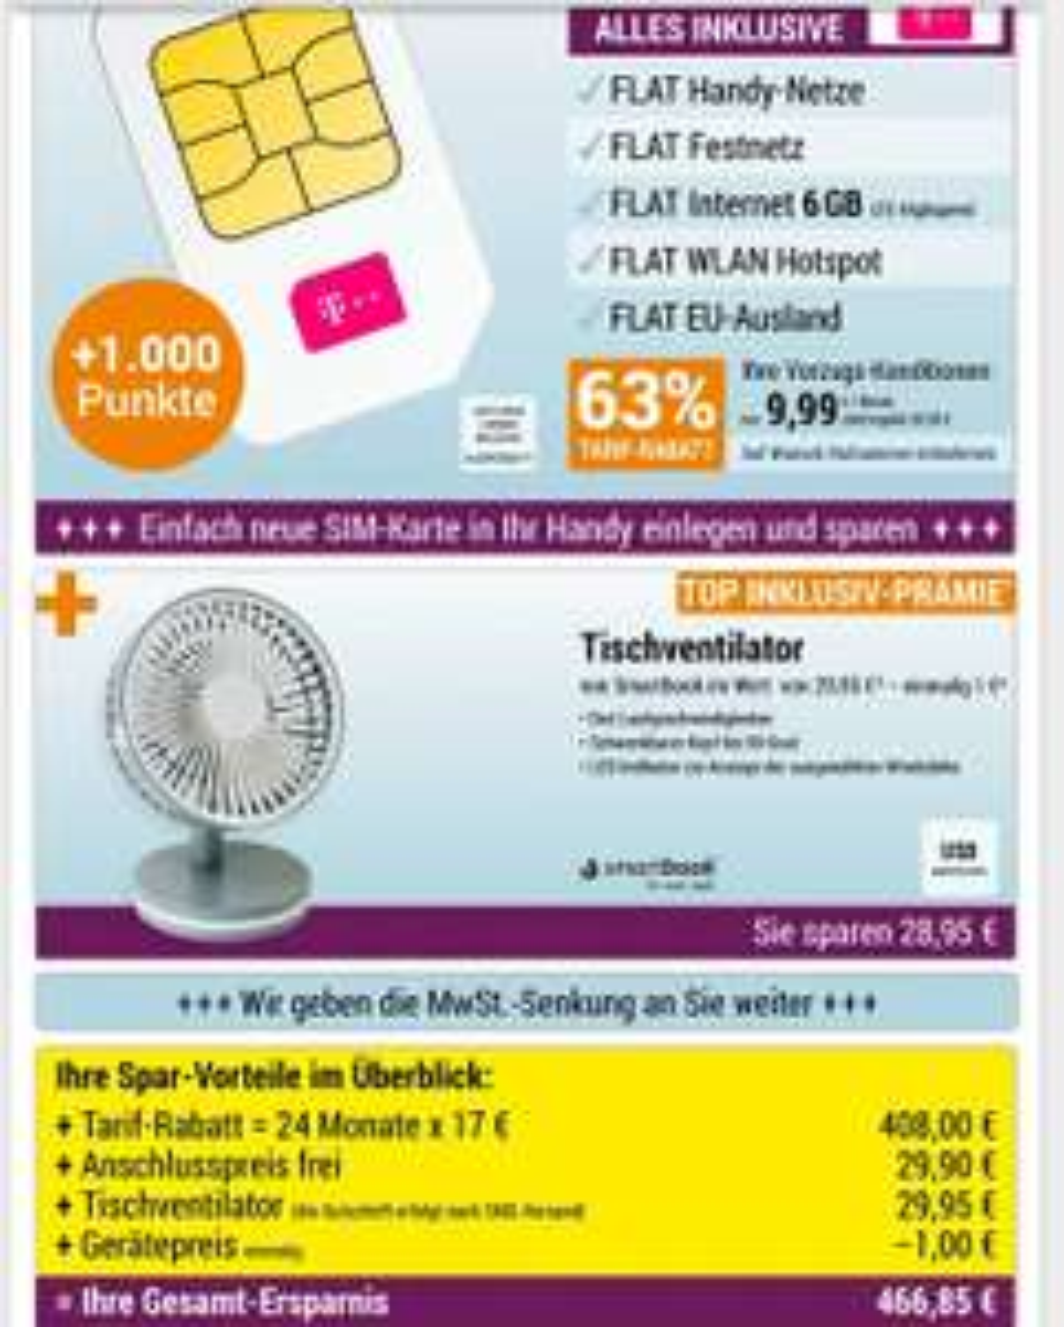 Deutschlandcard App Telekom 6gb LTE WLAN Hotspot flat Allnet flat, EU flat 9.99€ 24 Monate